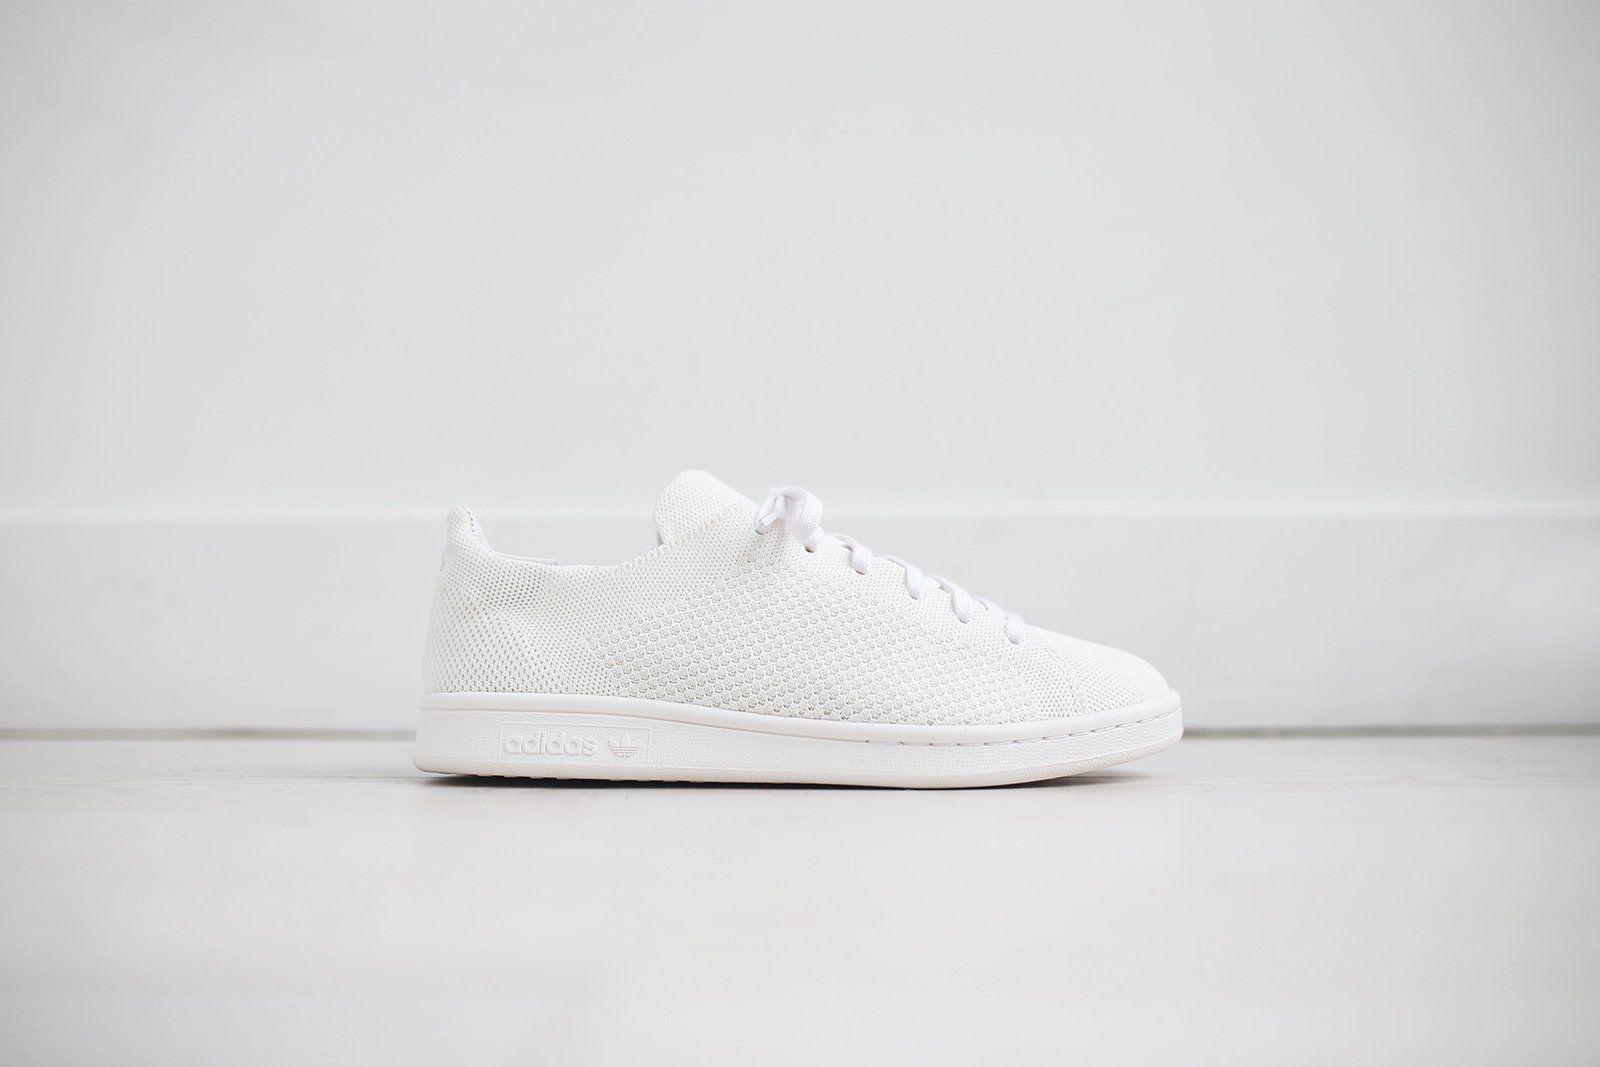 8c959a3a56712 adidas Originals x Pharrell Williams Hu Holi Stan Smith BC - Triple White